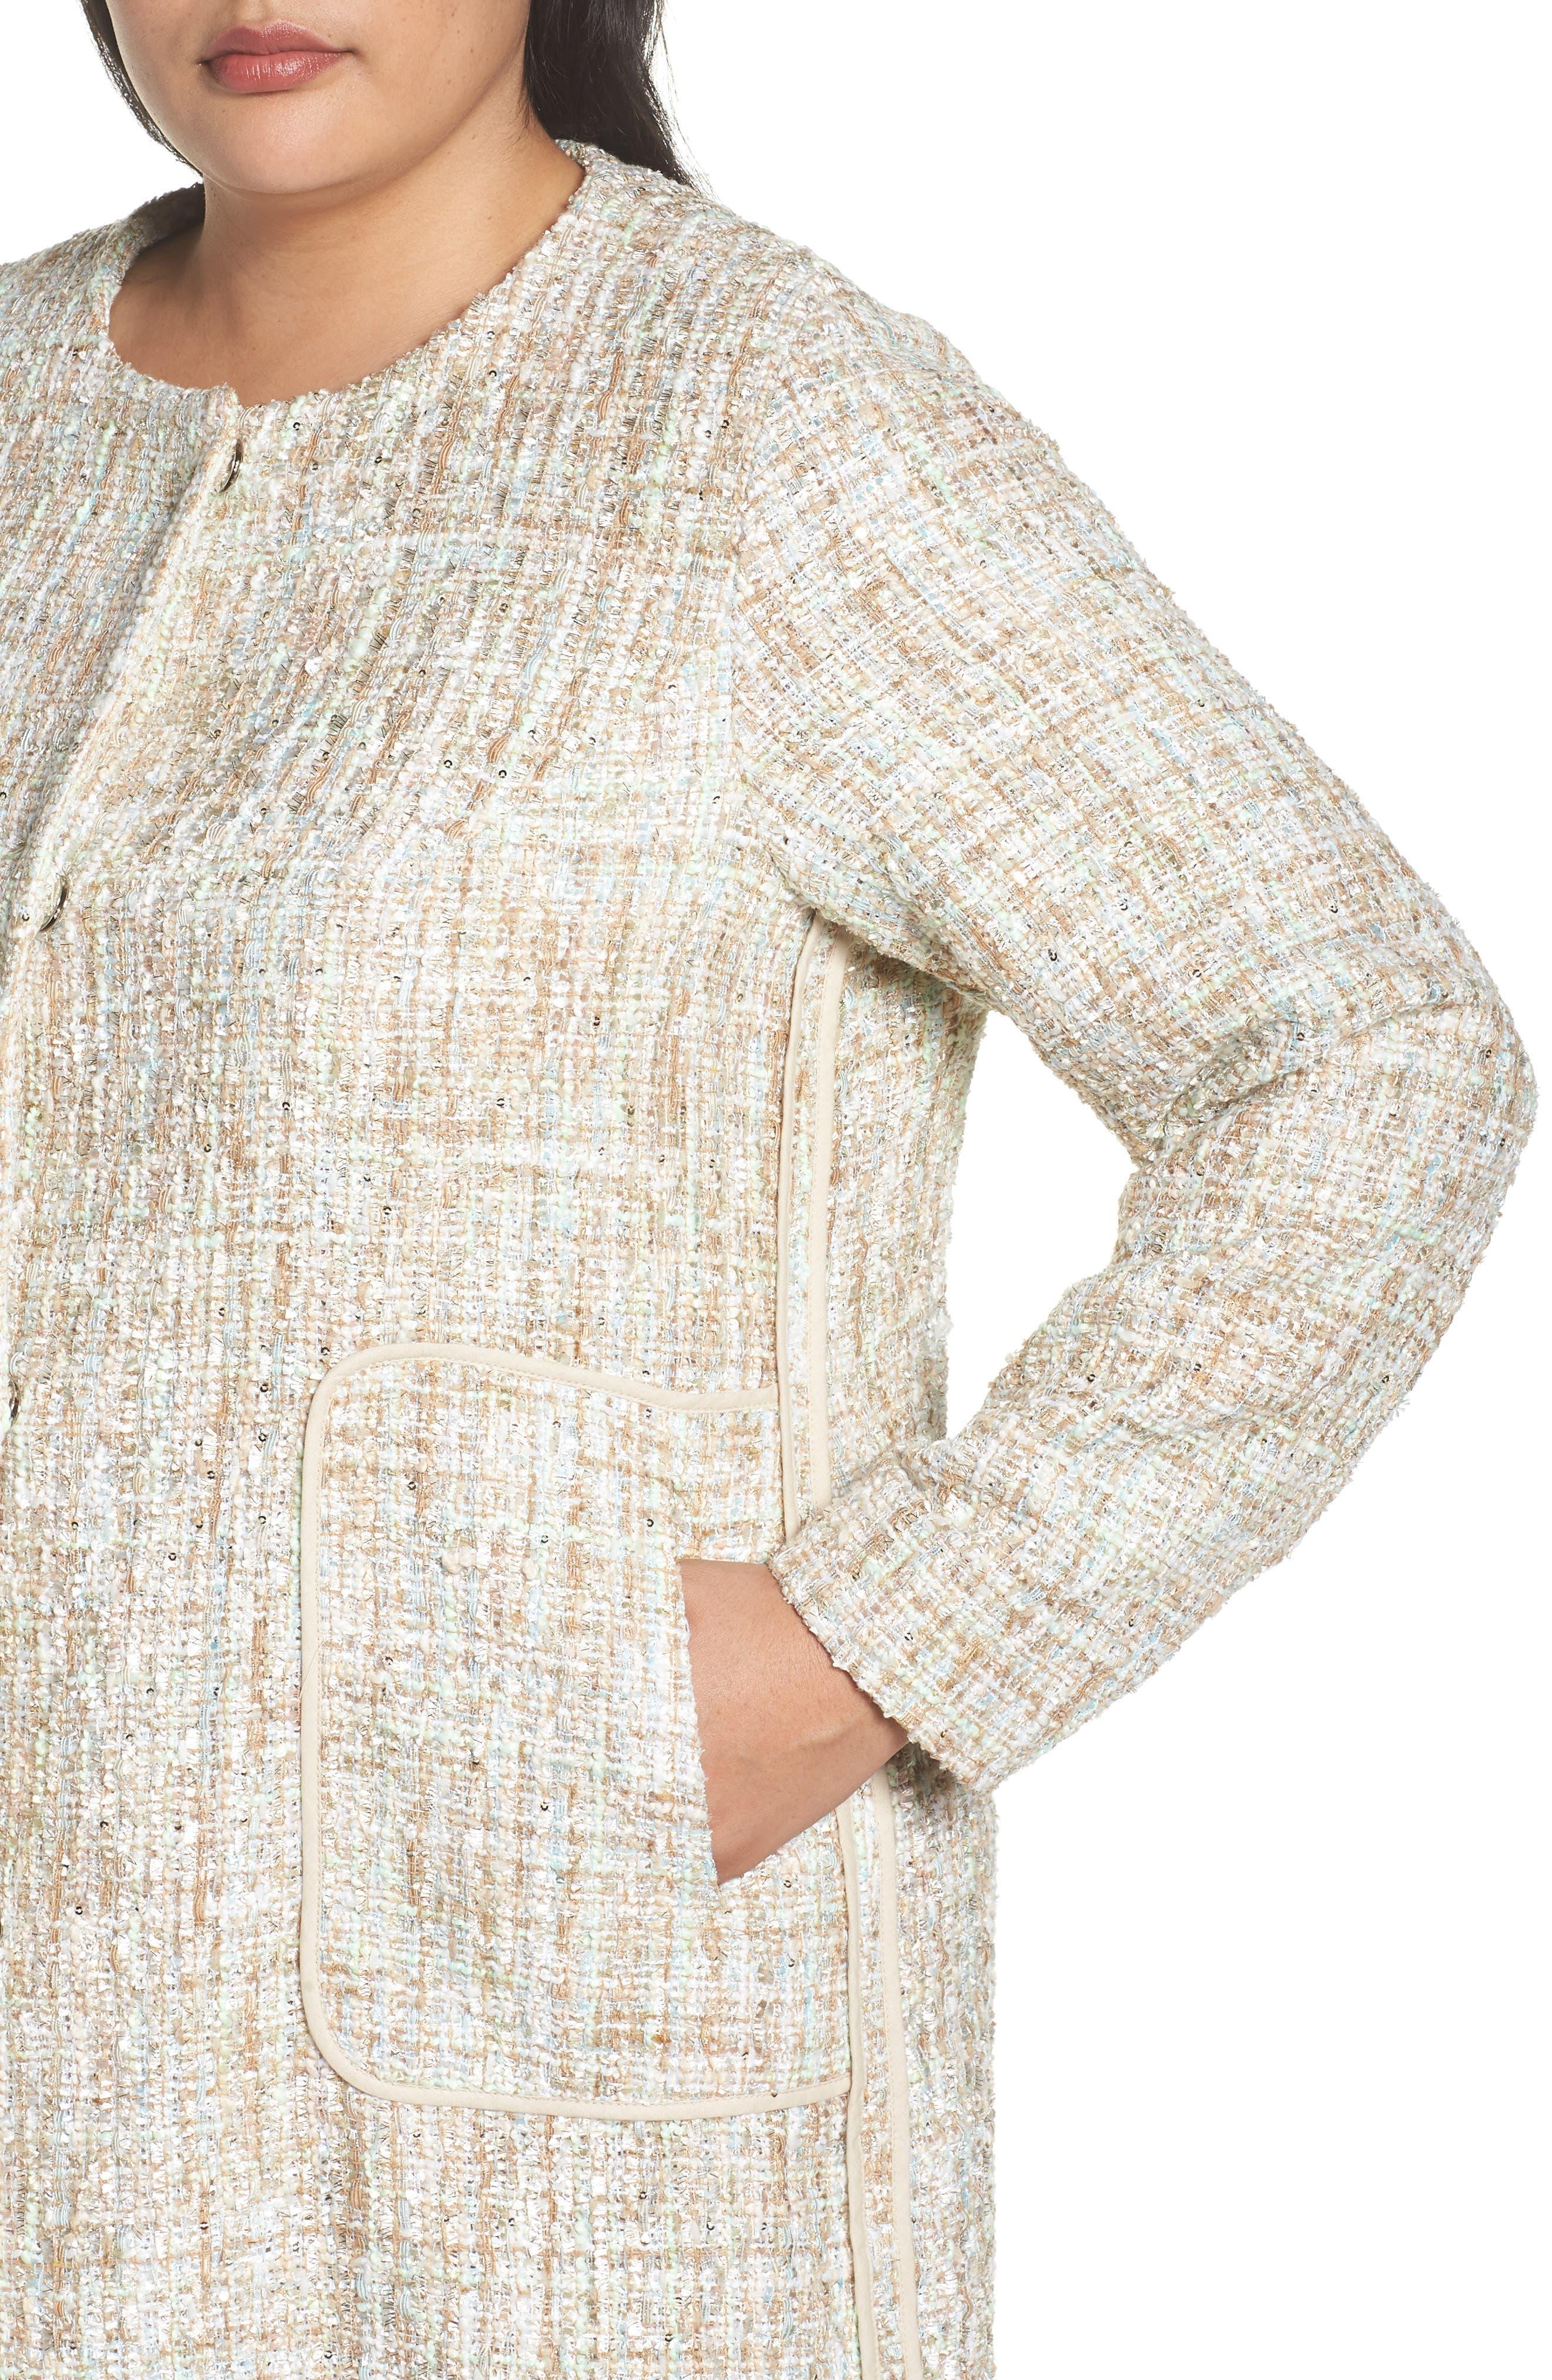 Metallic Tweed Jacket,                             Alternate thumbnail 3, color,                             White